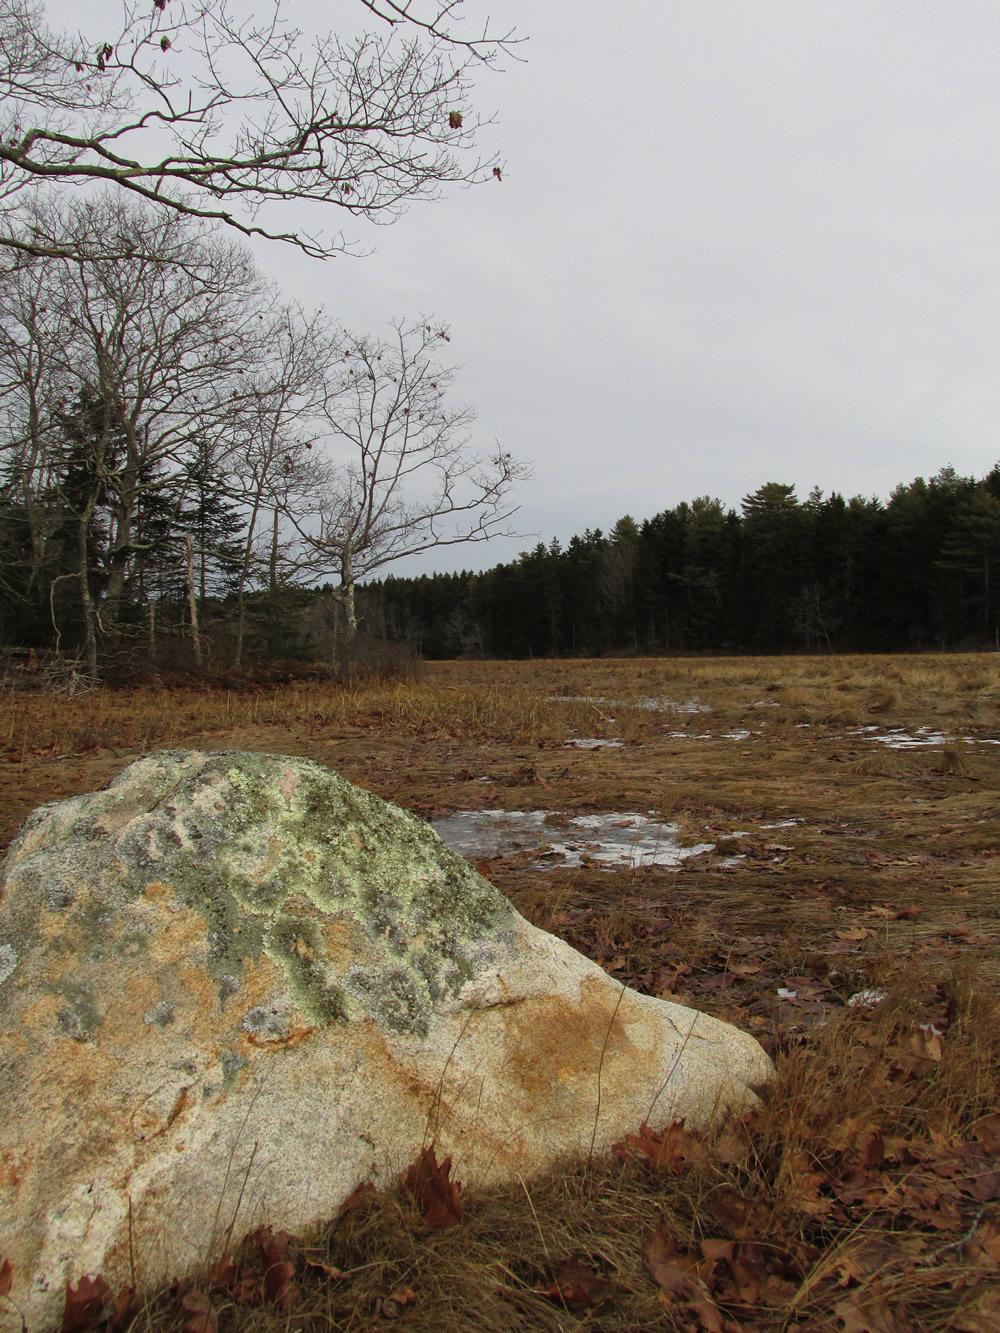 The marsh at Hook Rock Preserve